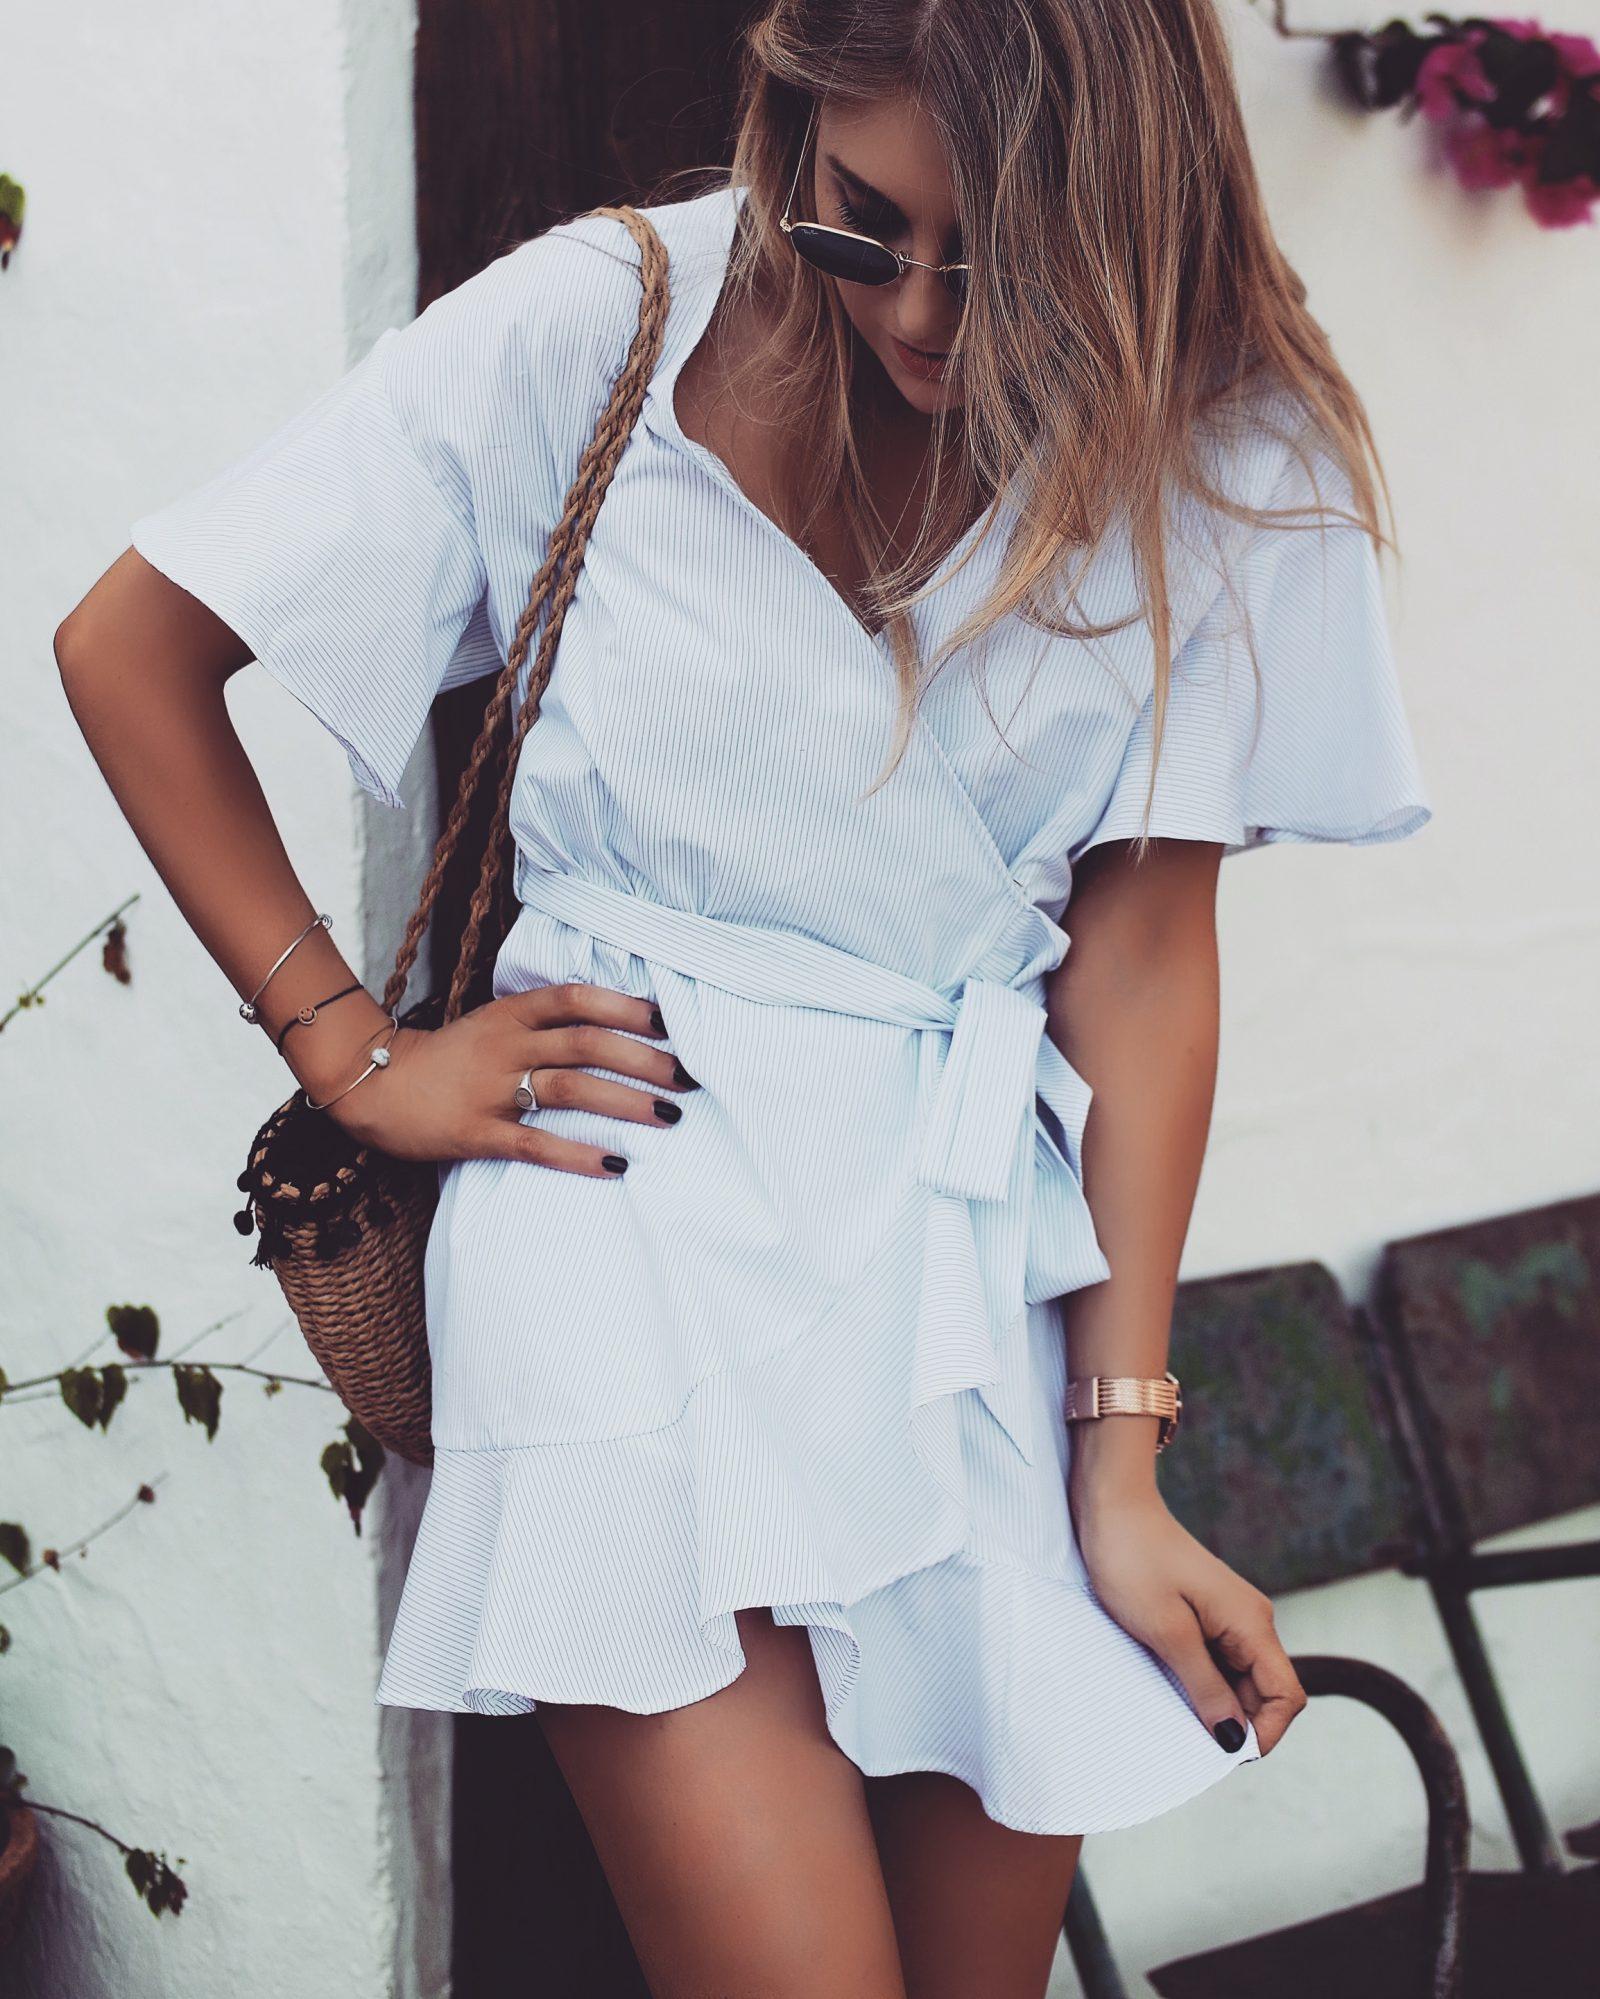 Topshop Dress - Summer Style